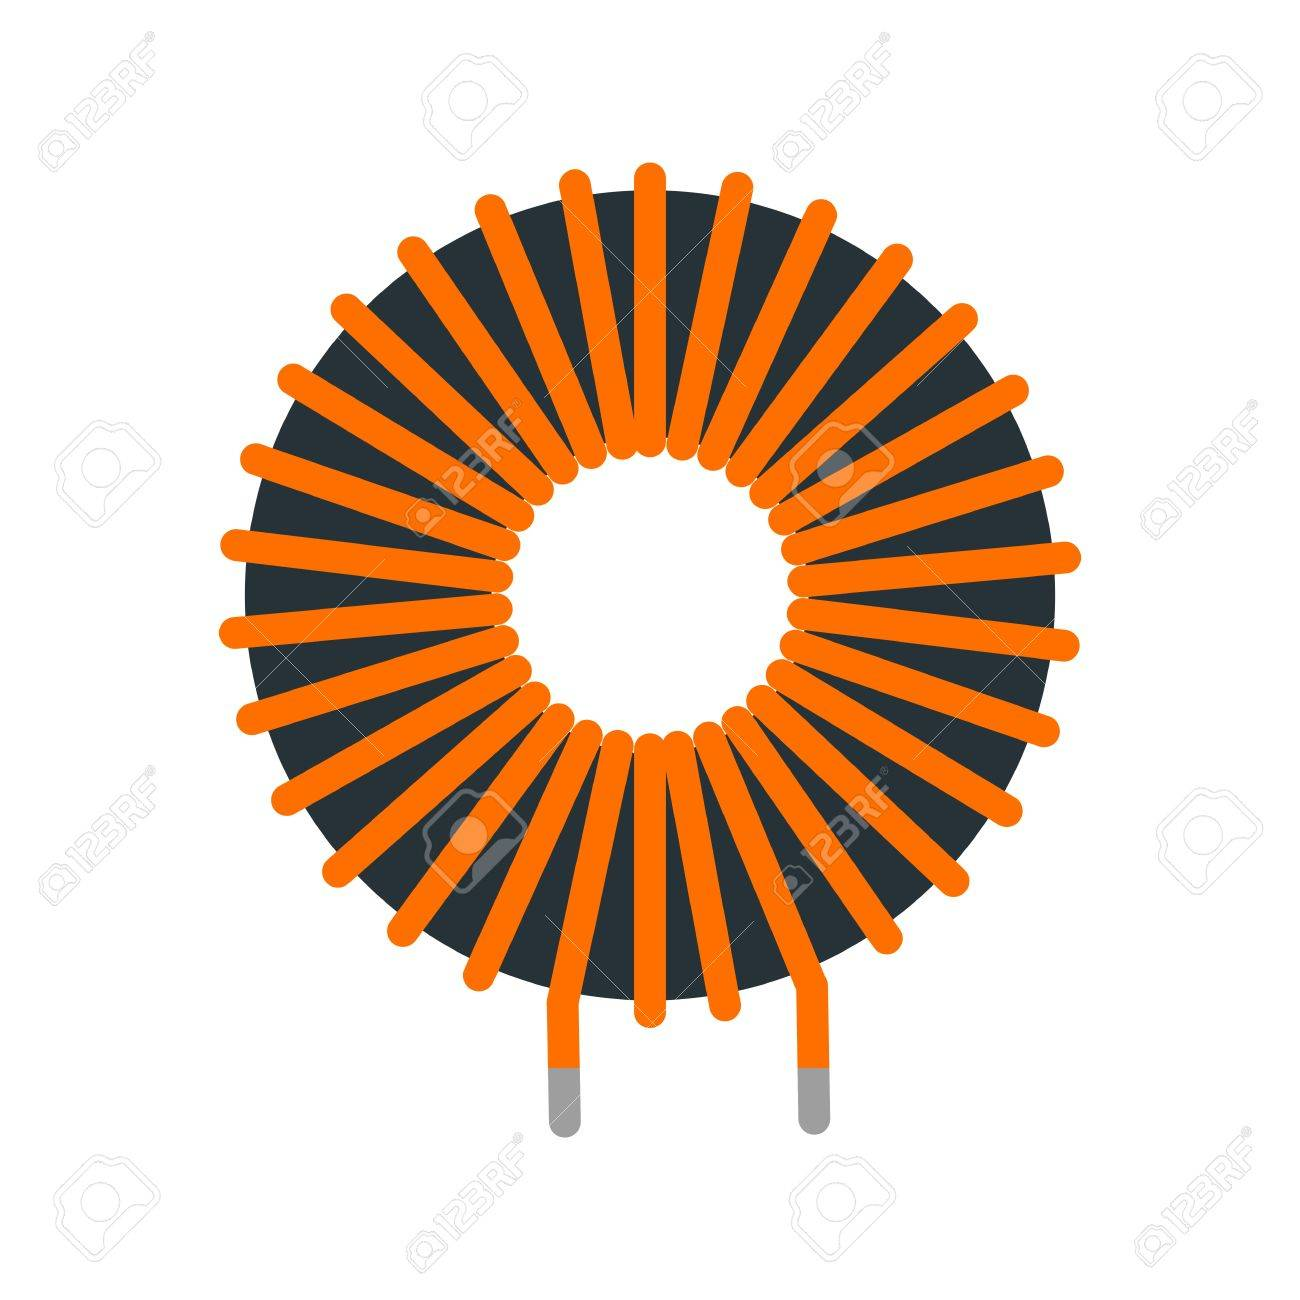 Kupfer, Draht, Induktor Symbol Vektor-Bild. Kann Auch Für ...